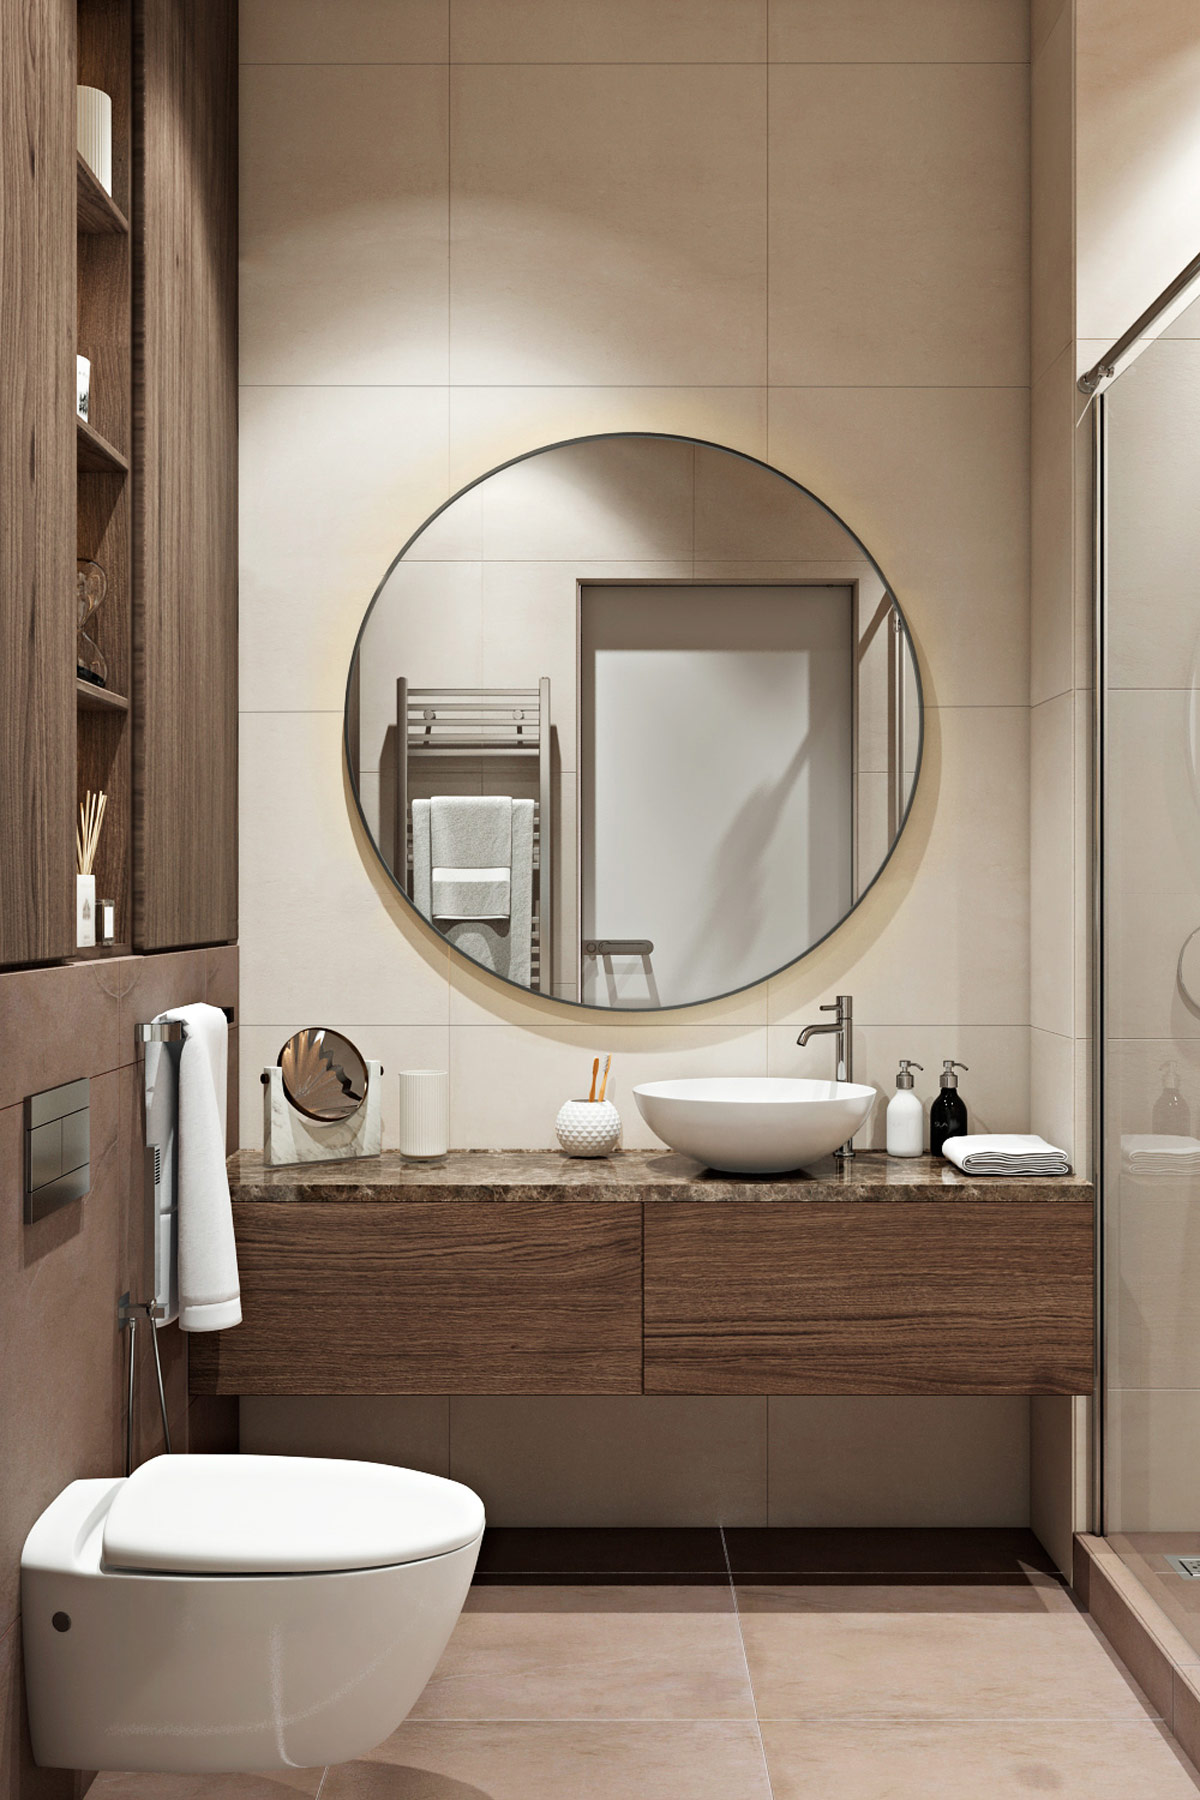 round-bathroom-mirror-above-stone-and-wood-bathroom-vanity